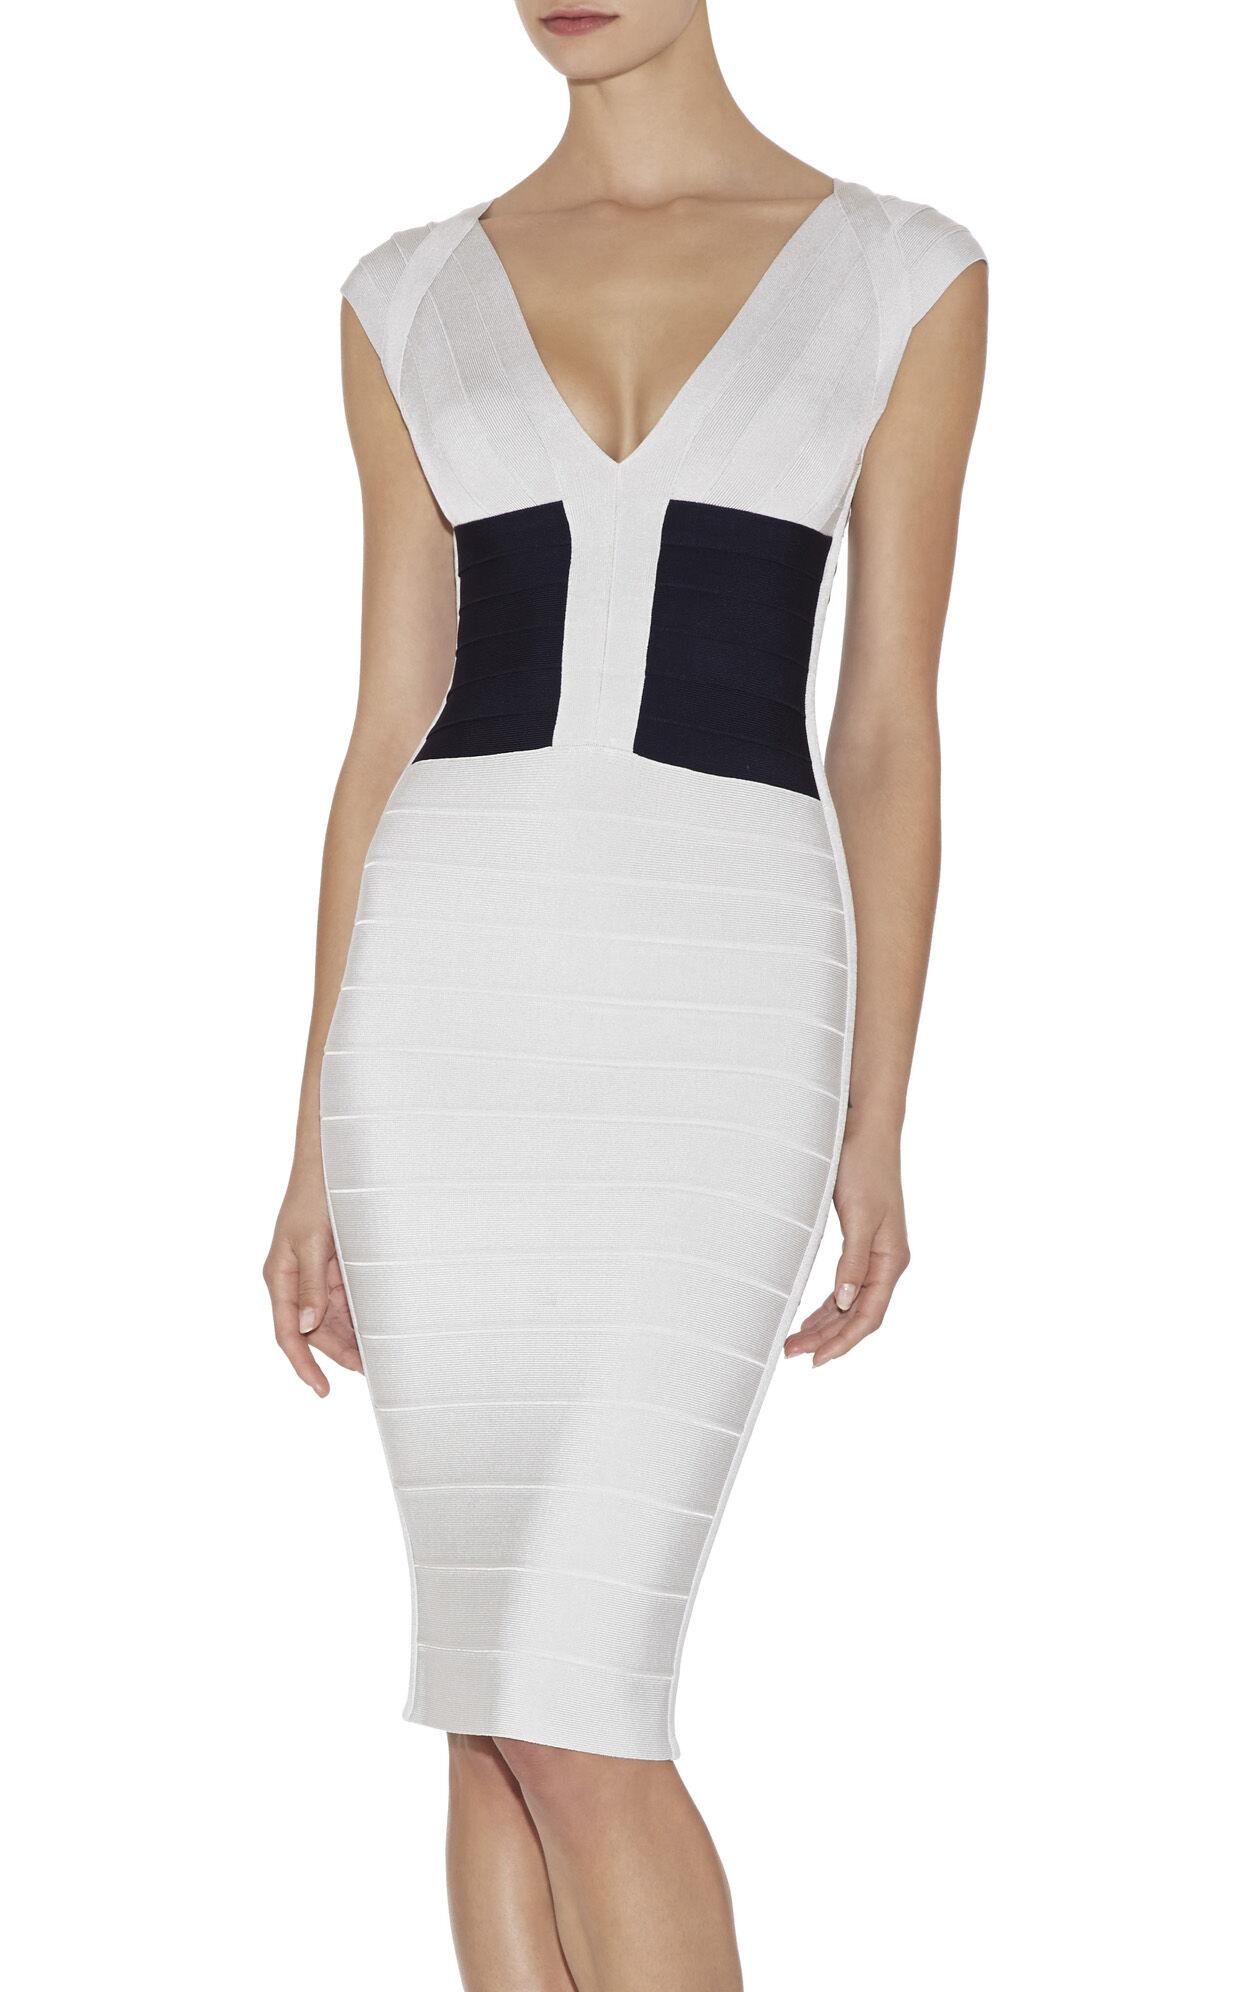 Kerstin Colorblocked Dress